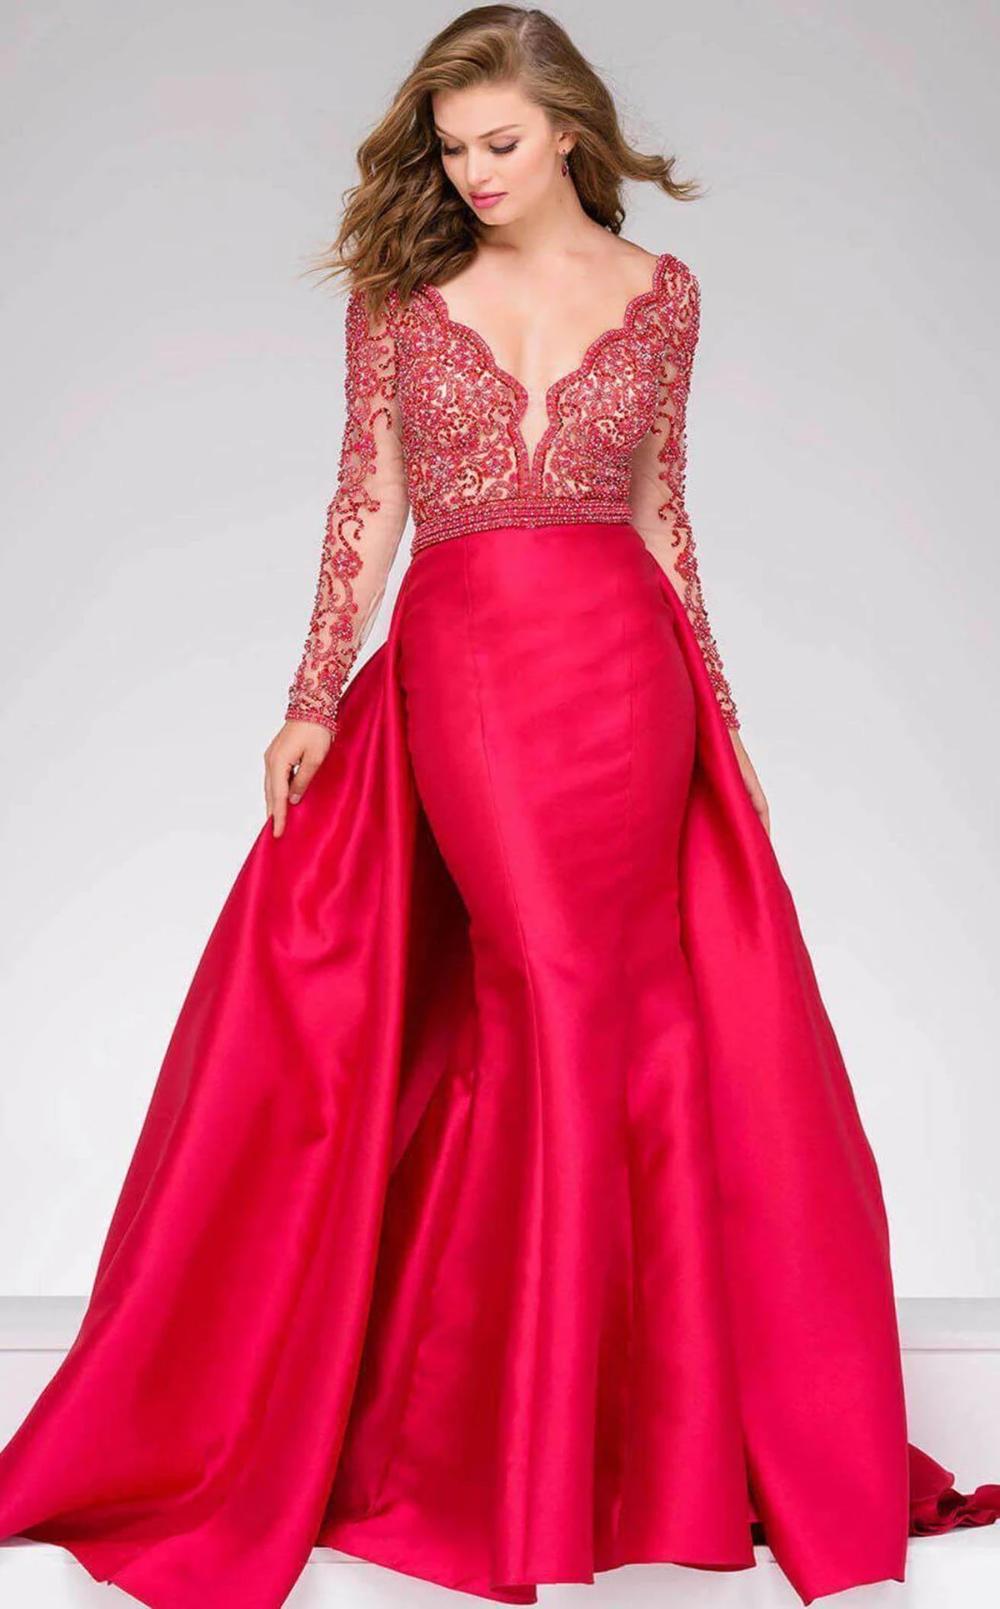 Jovani 46708bg Dress In 2021 Jovani Dresses Pageant Dresses Prom Dresses Jovani [ 1609 x 1000 Pixel ]